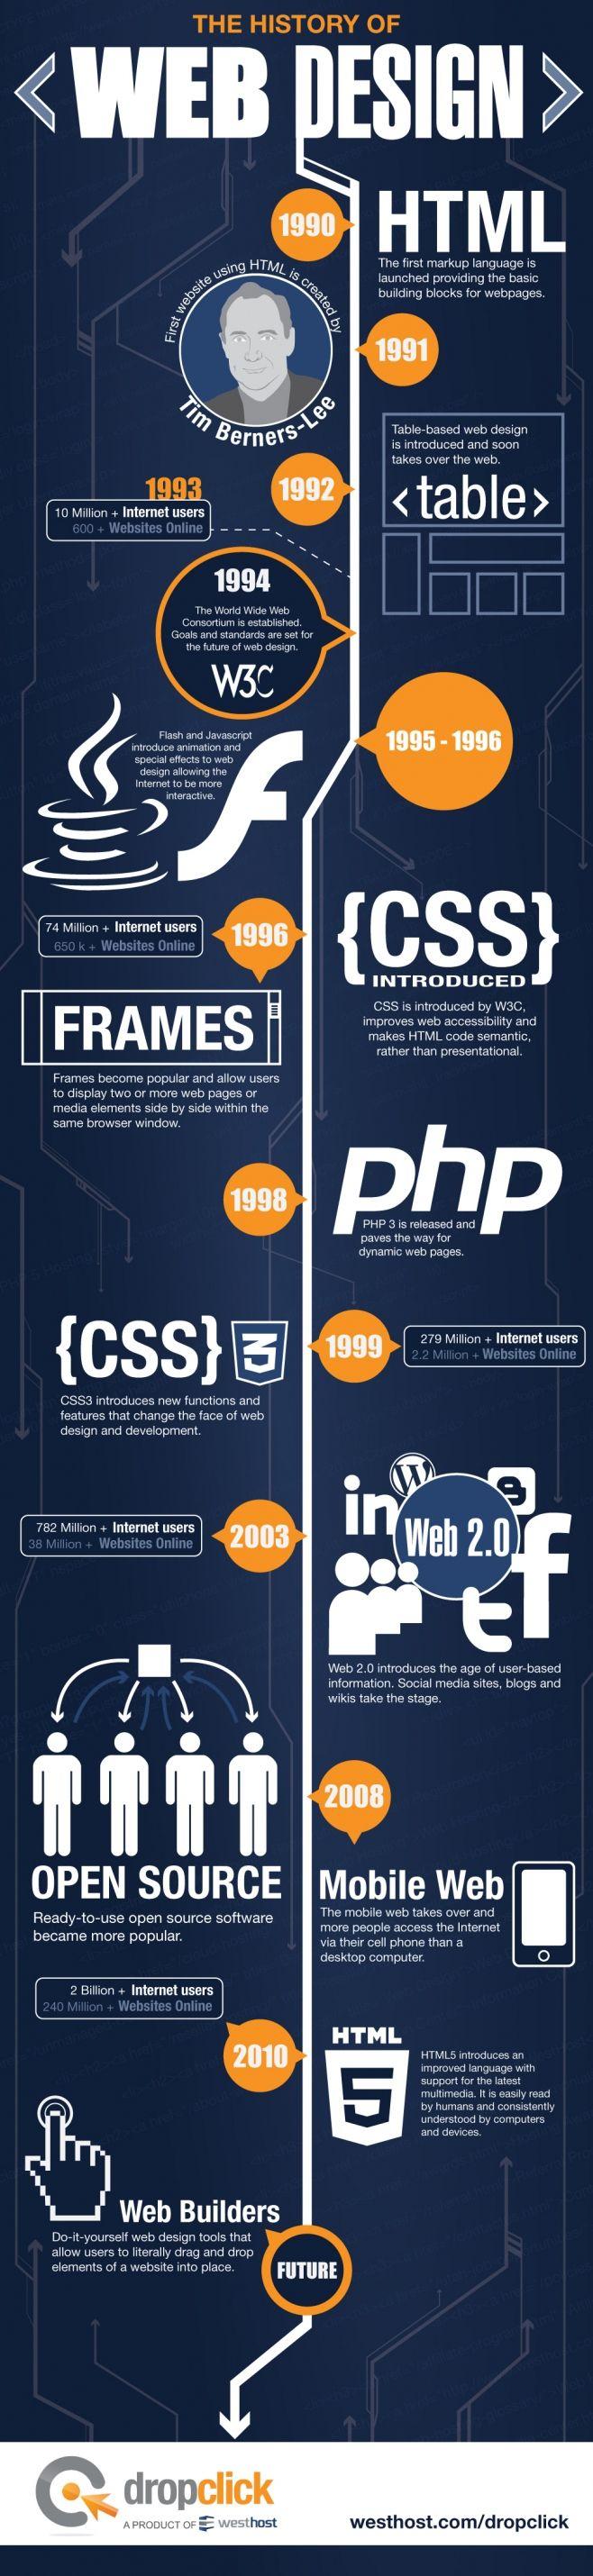 The history of web design. La historia del diseño web